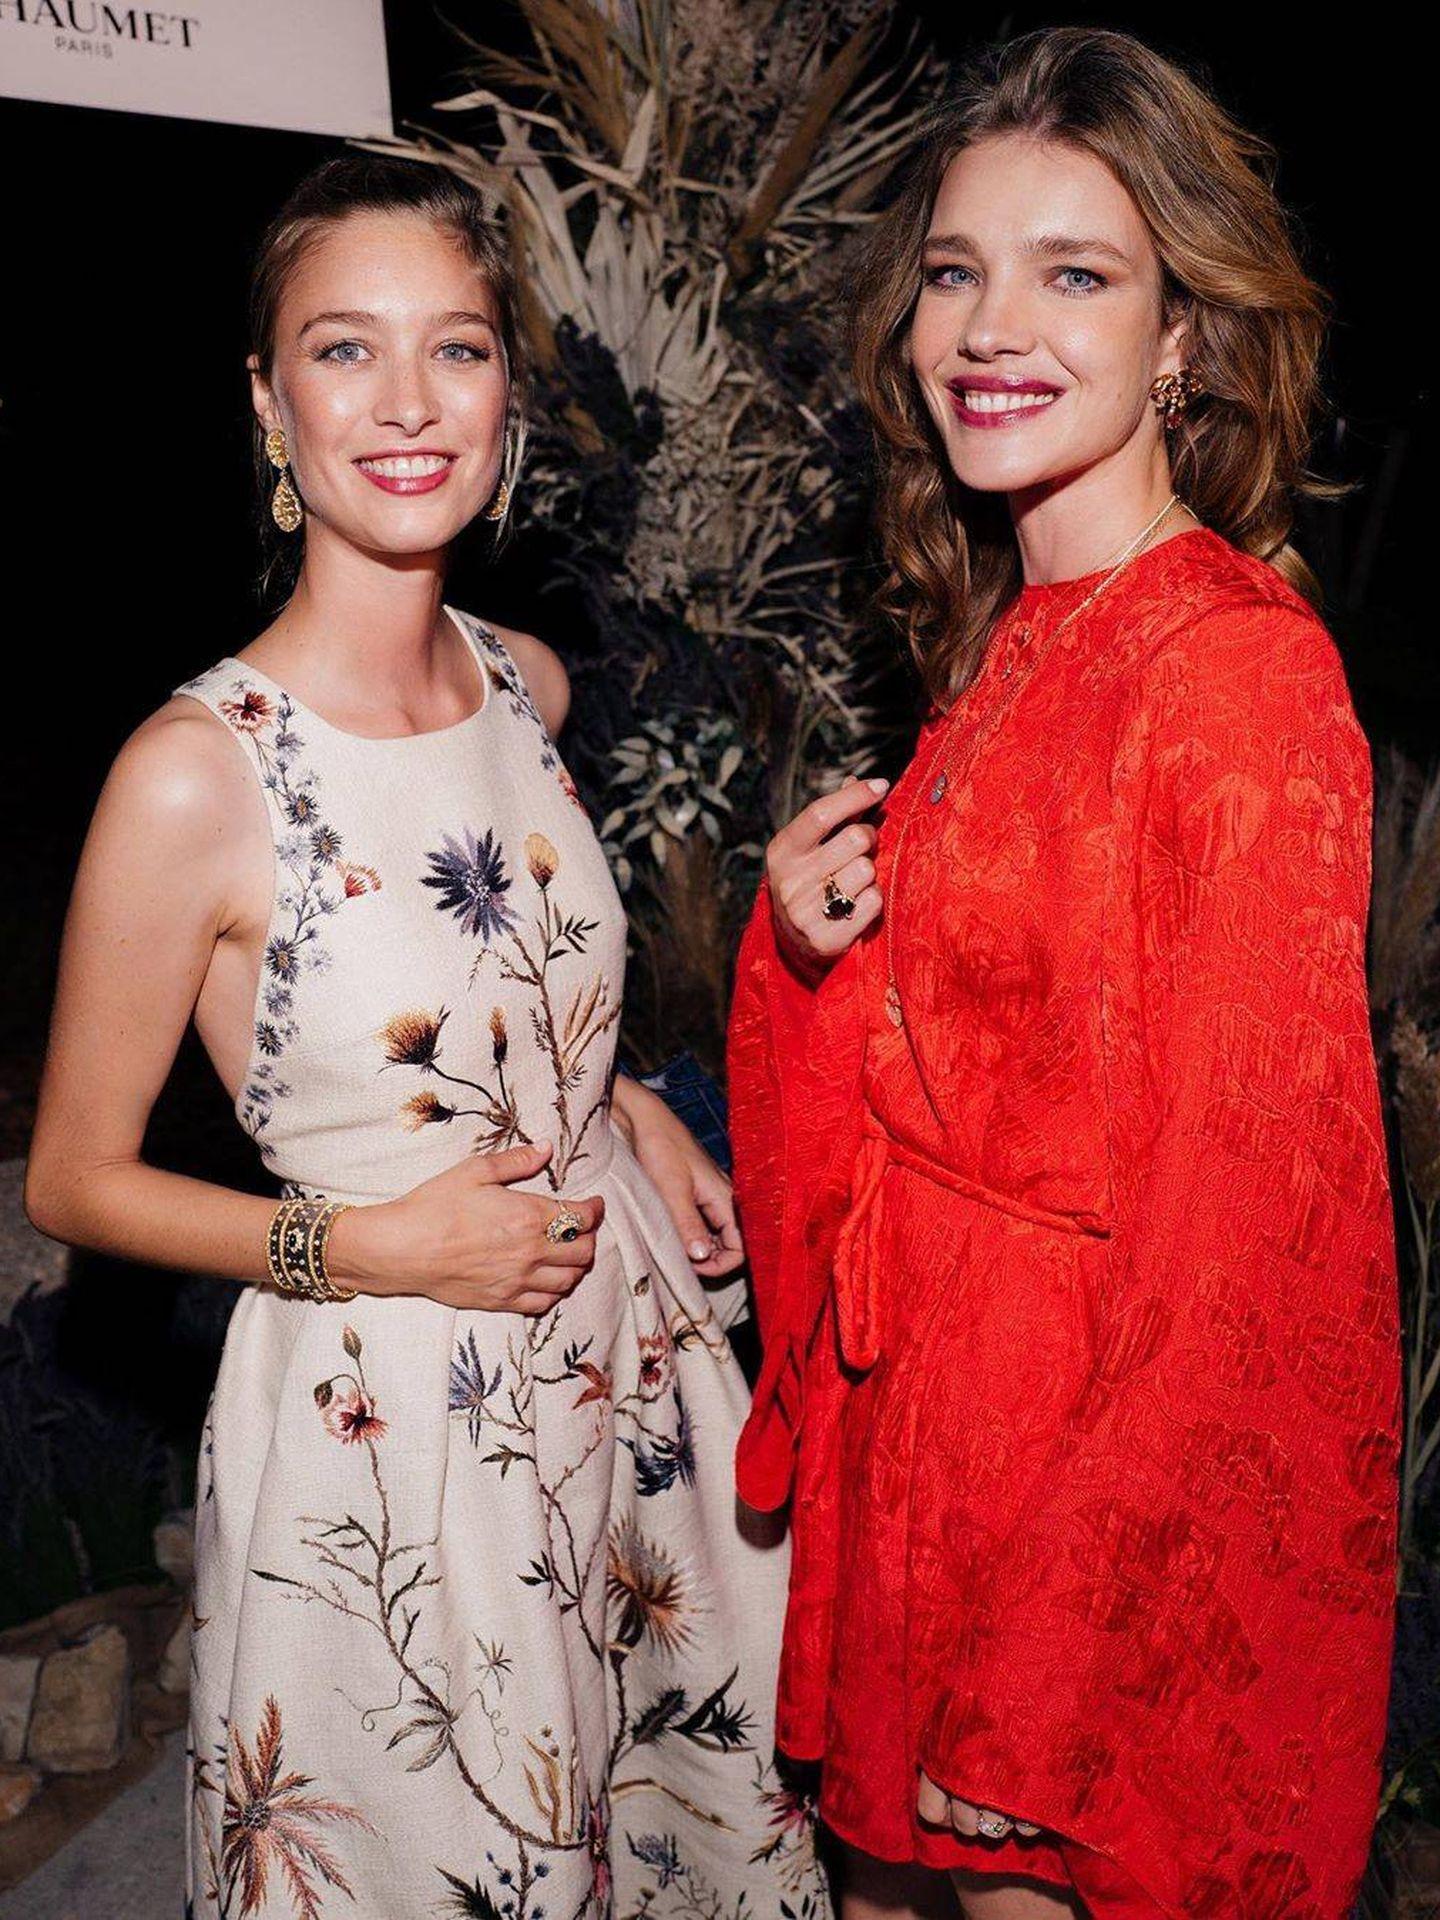 Beatrice Borromeo y la modelo Natalia Vodianova. (Instagram @natasupernova)